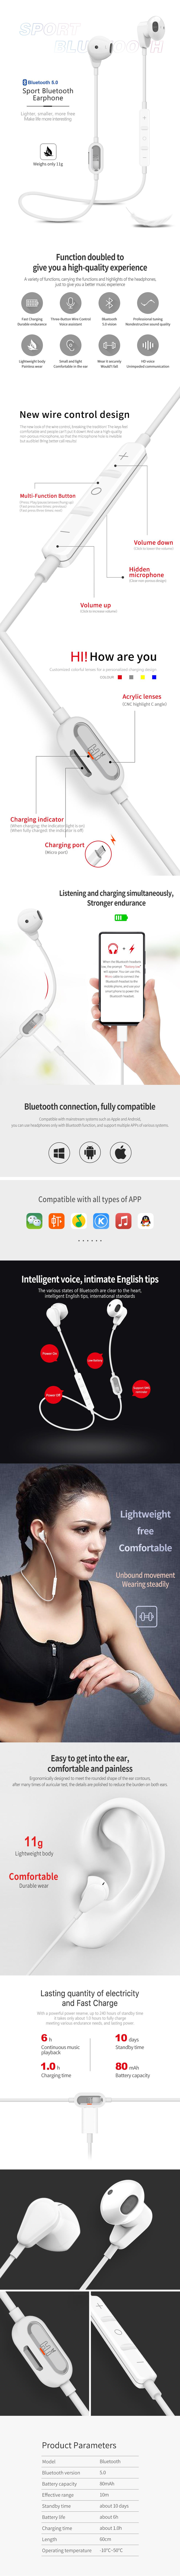 2019 Original BT Earphone earbuds wireless waterproof V5.0 earphone with microphone